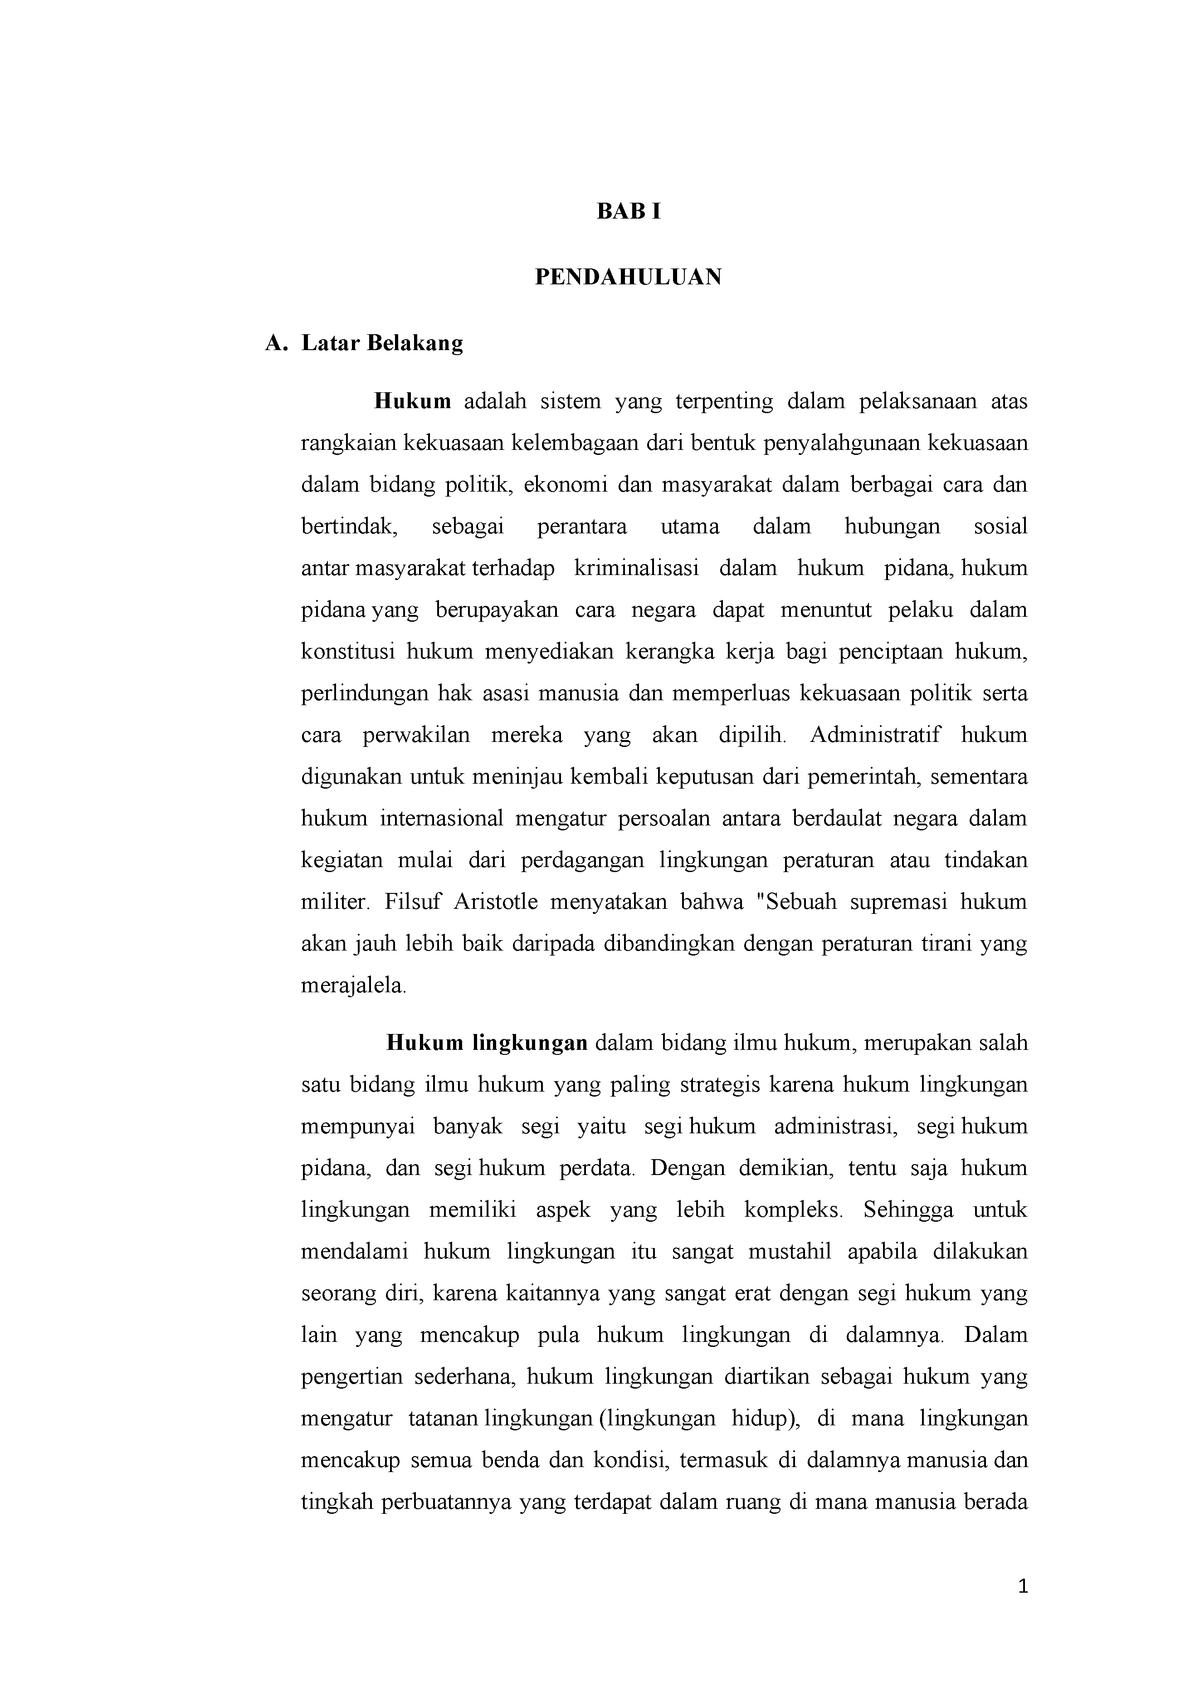 Makalah Hukum Lingkungan 320380796 Studocu